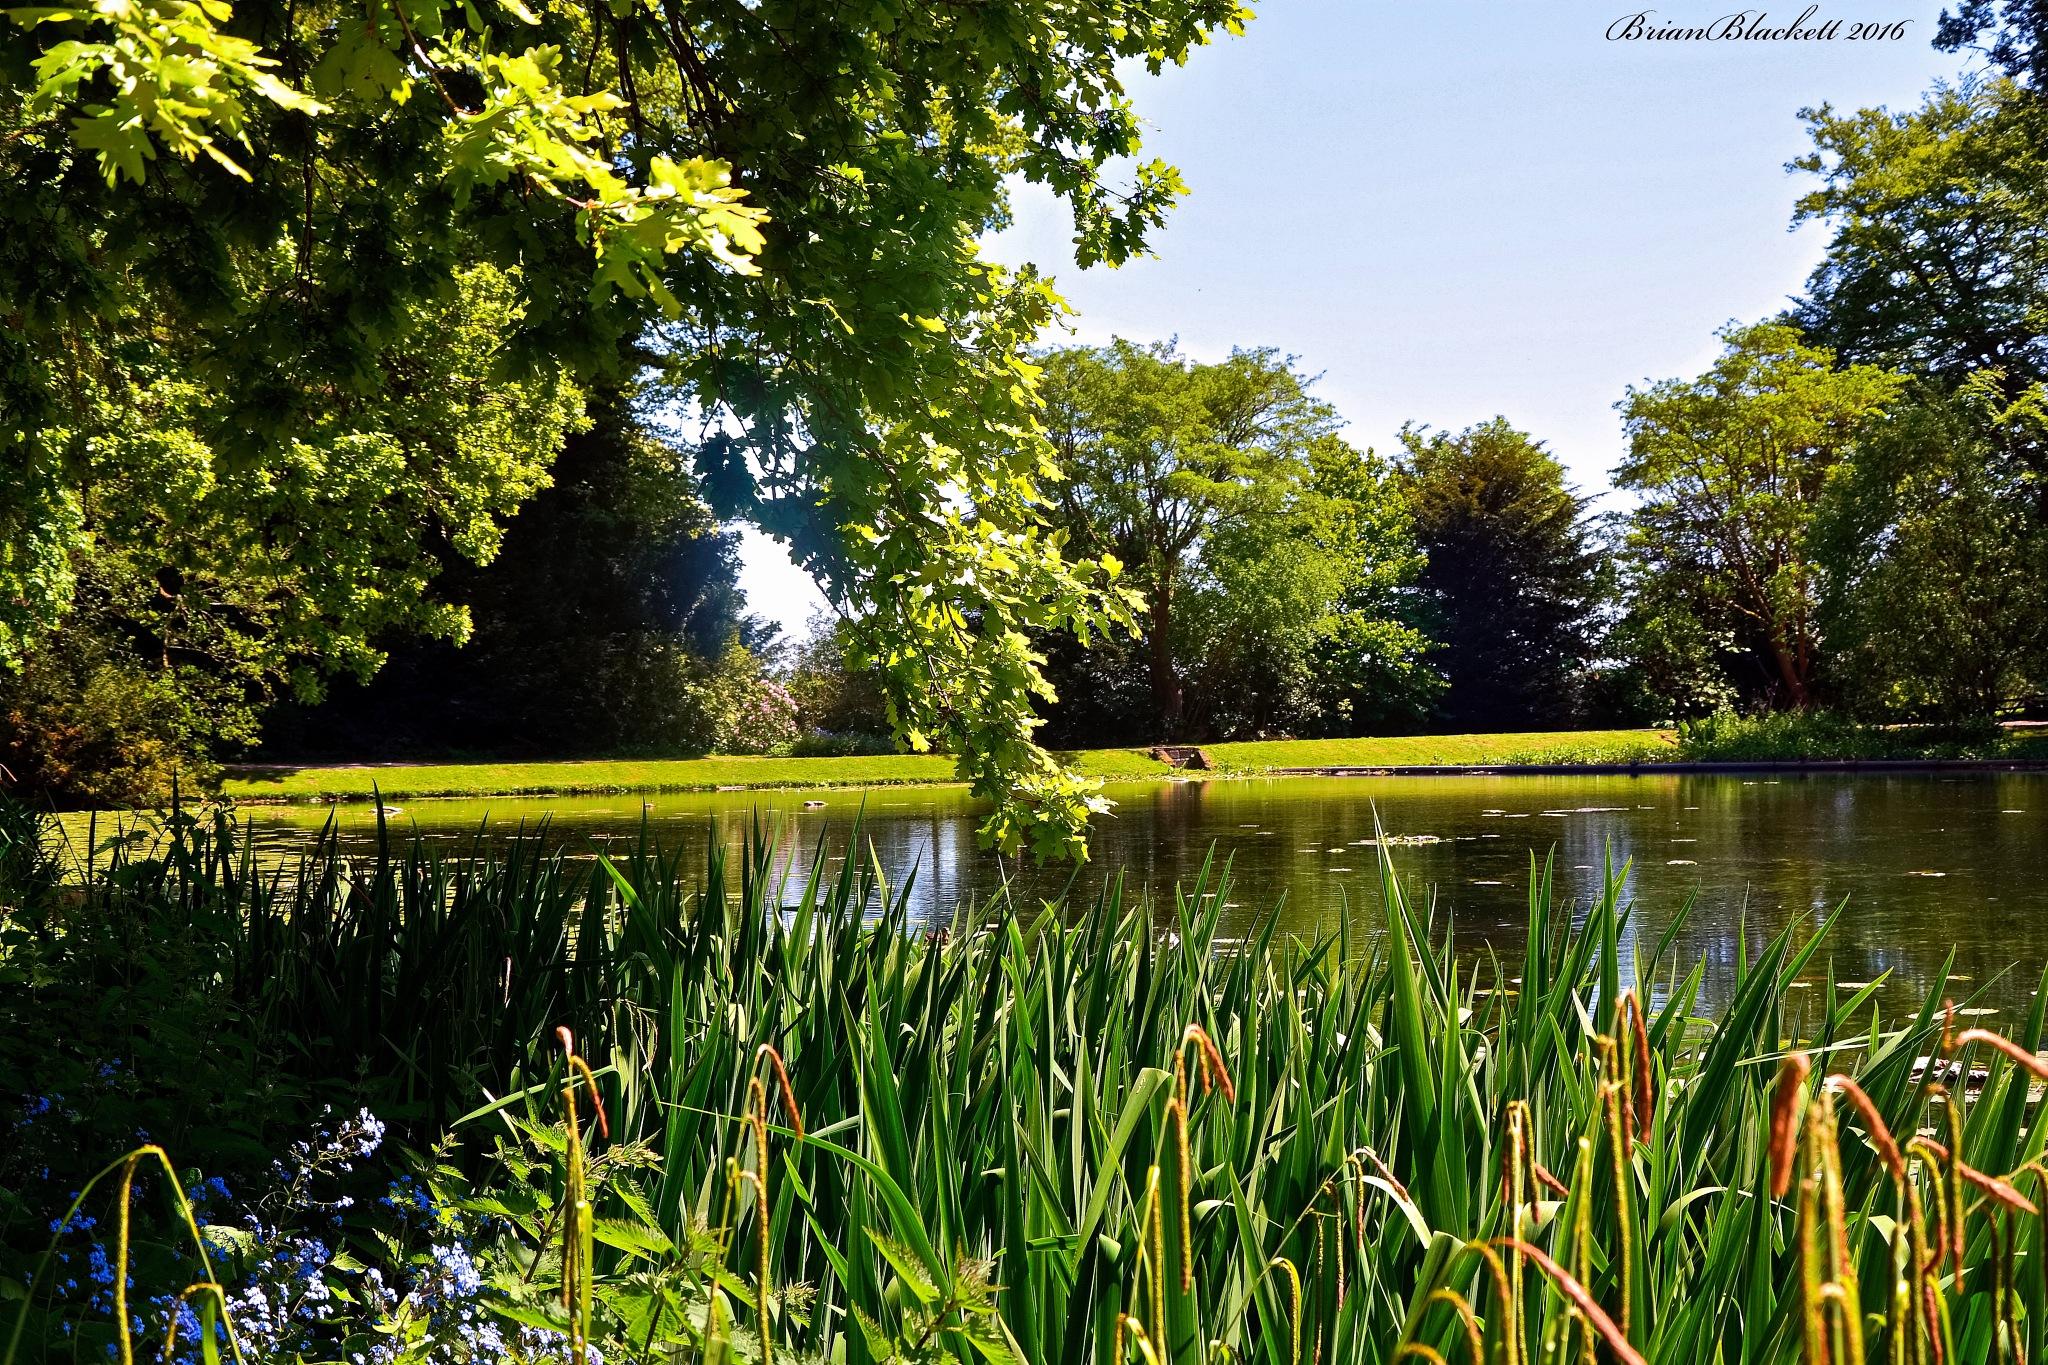 The Lake at Wallington Hall Northumberland UK by brianblackett